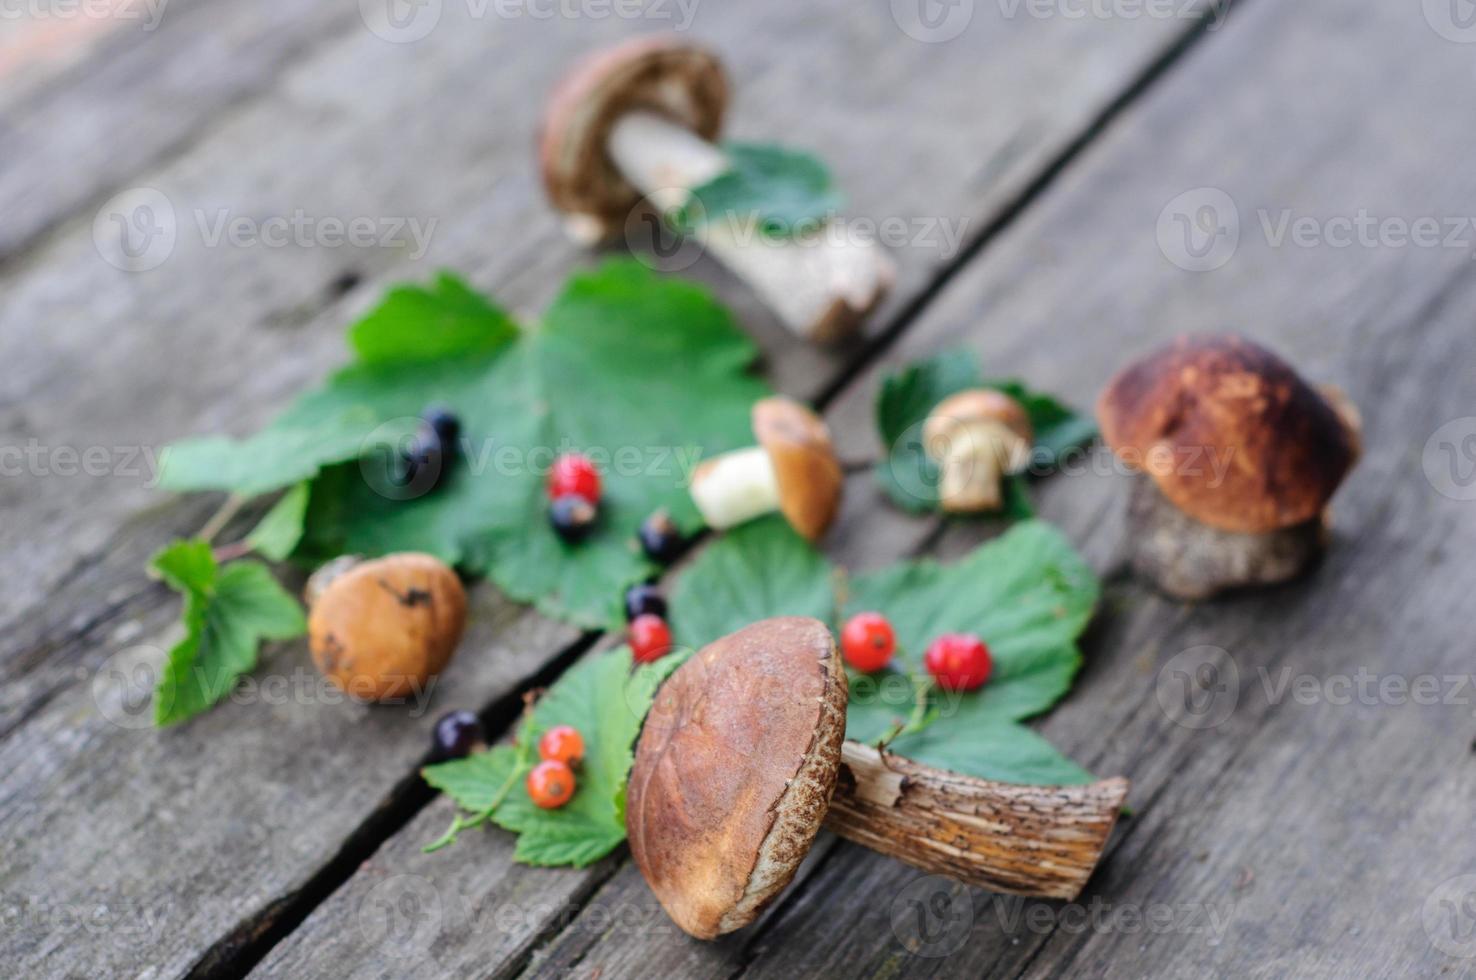 setas del bosque comestibles recogidas foto